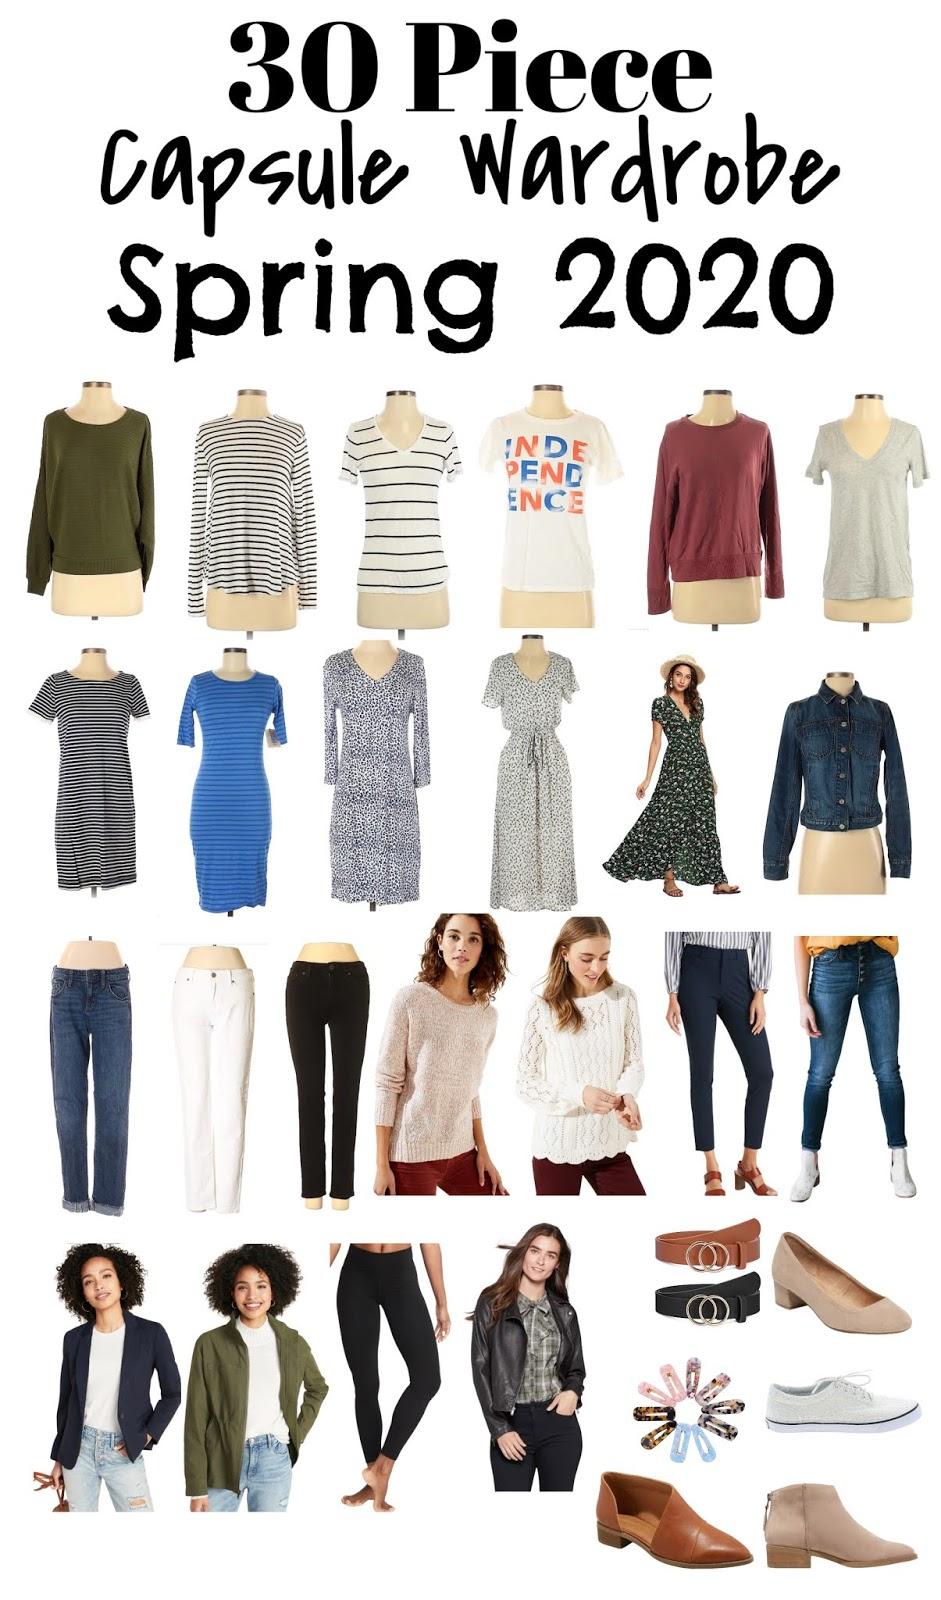 Capsule wardrobe 2020 checklist. Classic capsule wardrobe 2020. Capsule wardrobe spring 2020. Spring 2020 capsule wardrobe.  #minimalism #spring #clothing #fashion #capsulewardrobe #30piececloset #closet